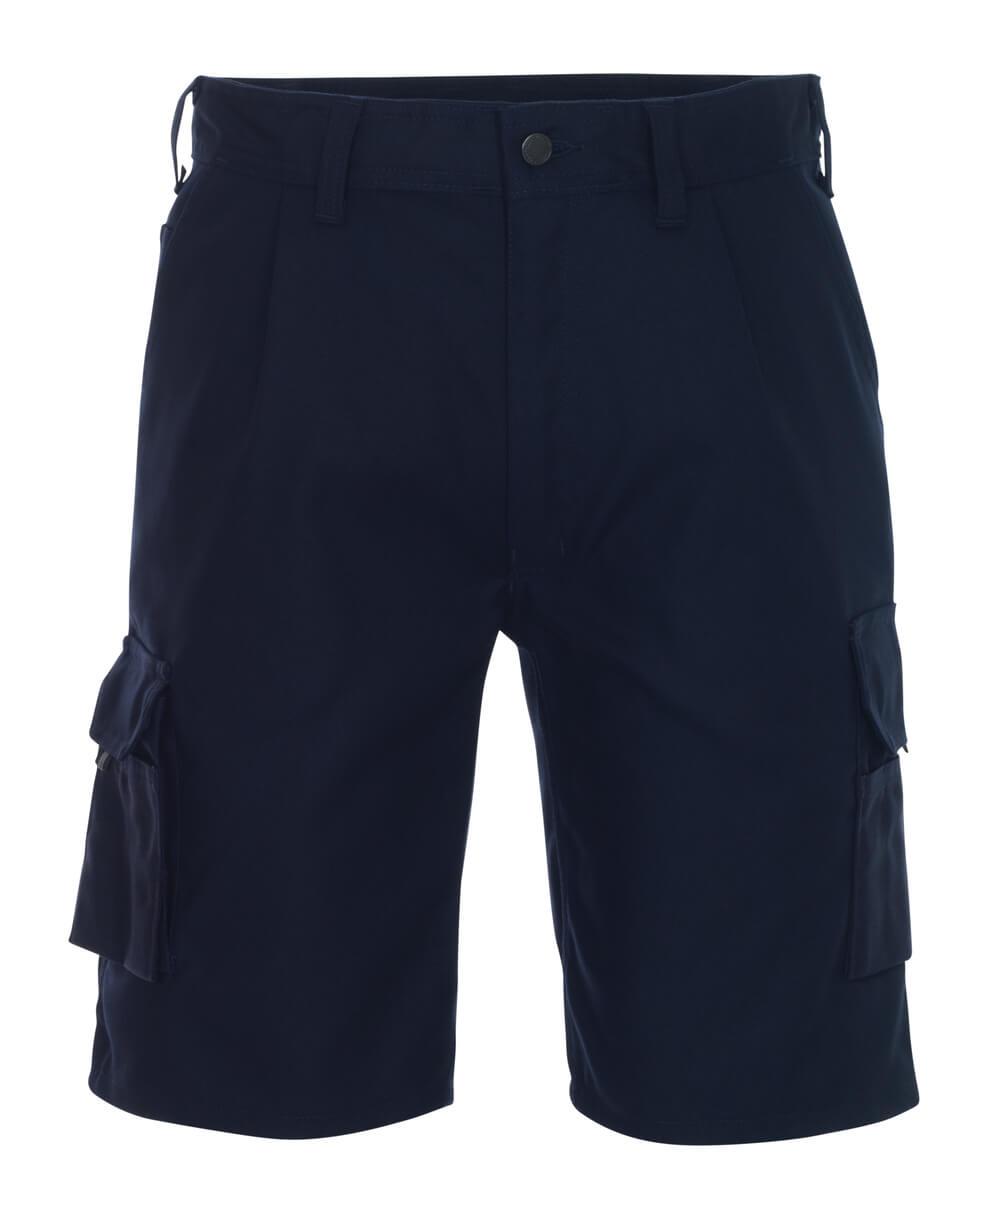 03049-010-01 Shorts - navy